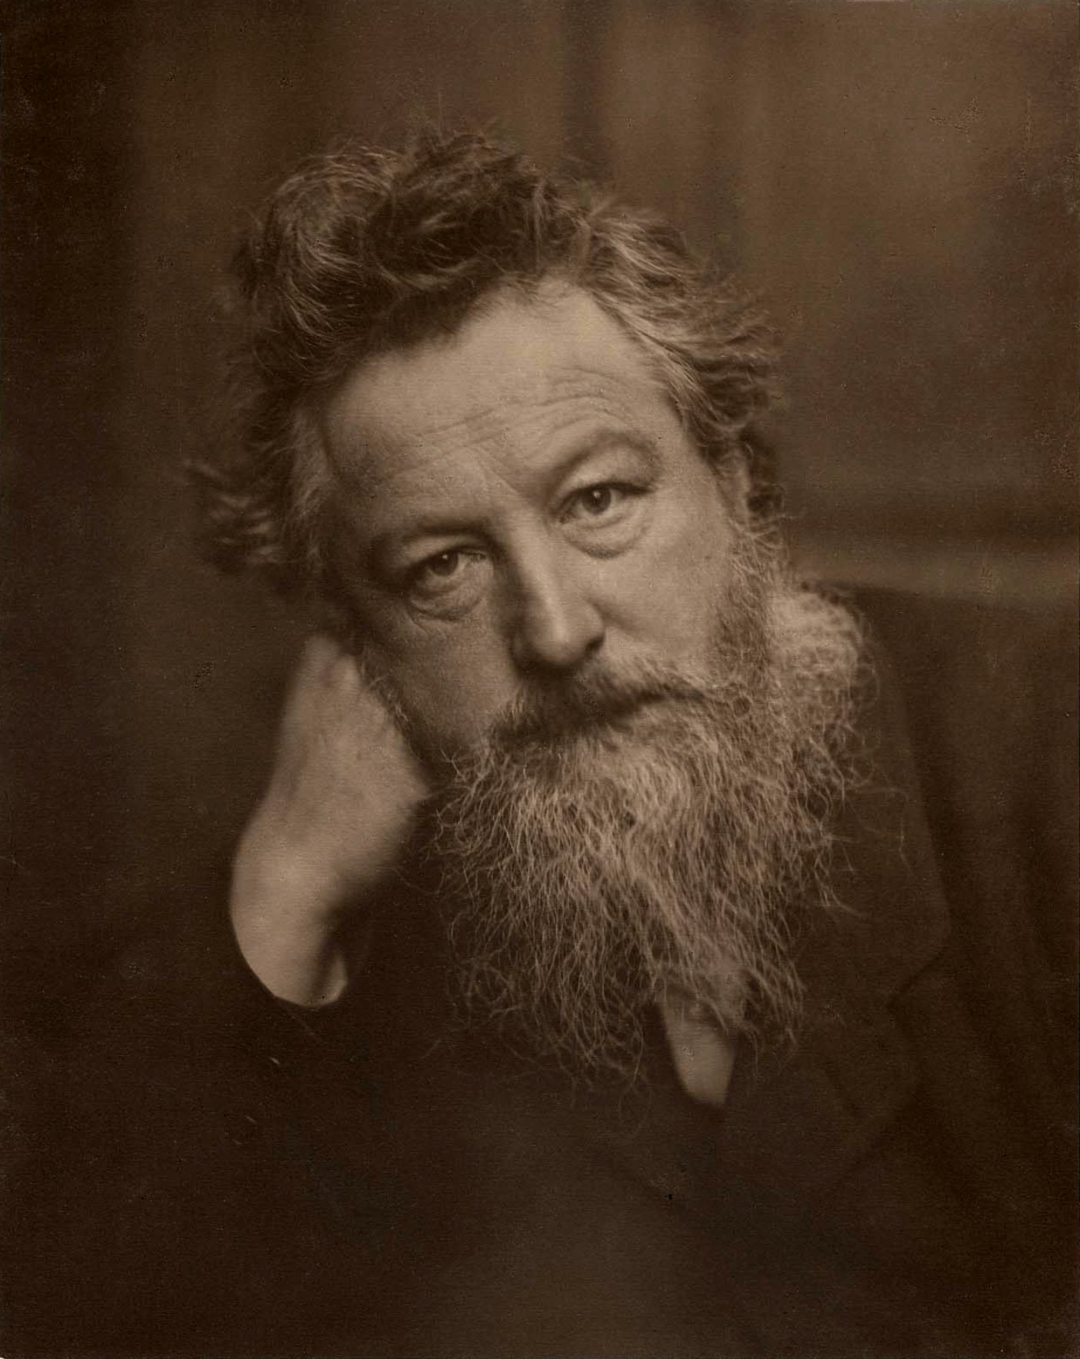 William Morris, aged 53|©Wikicommons